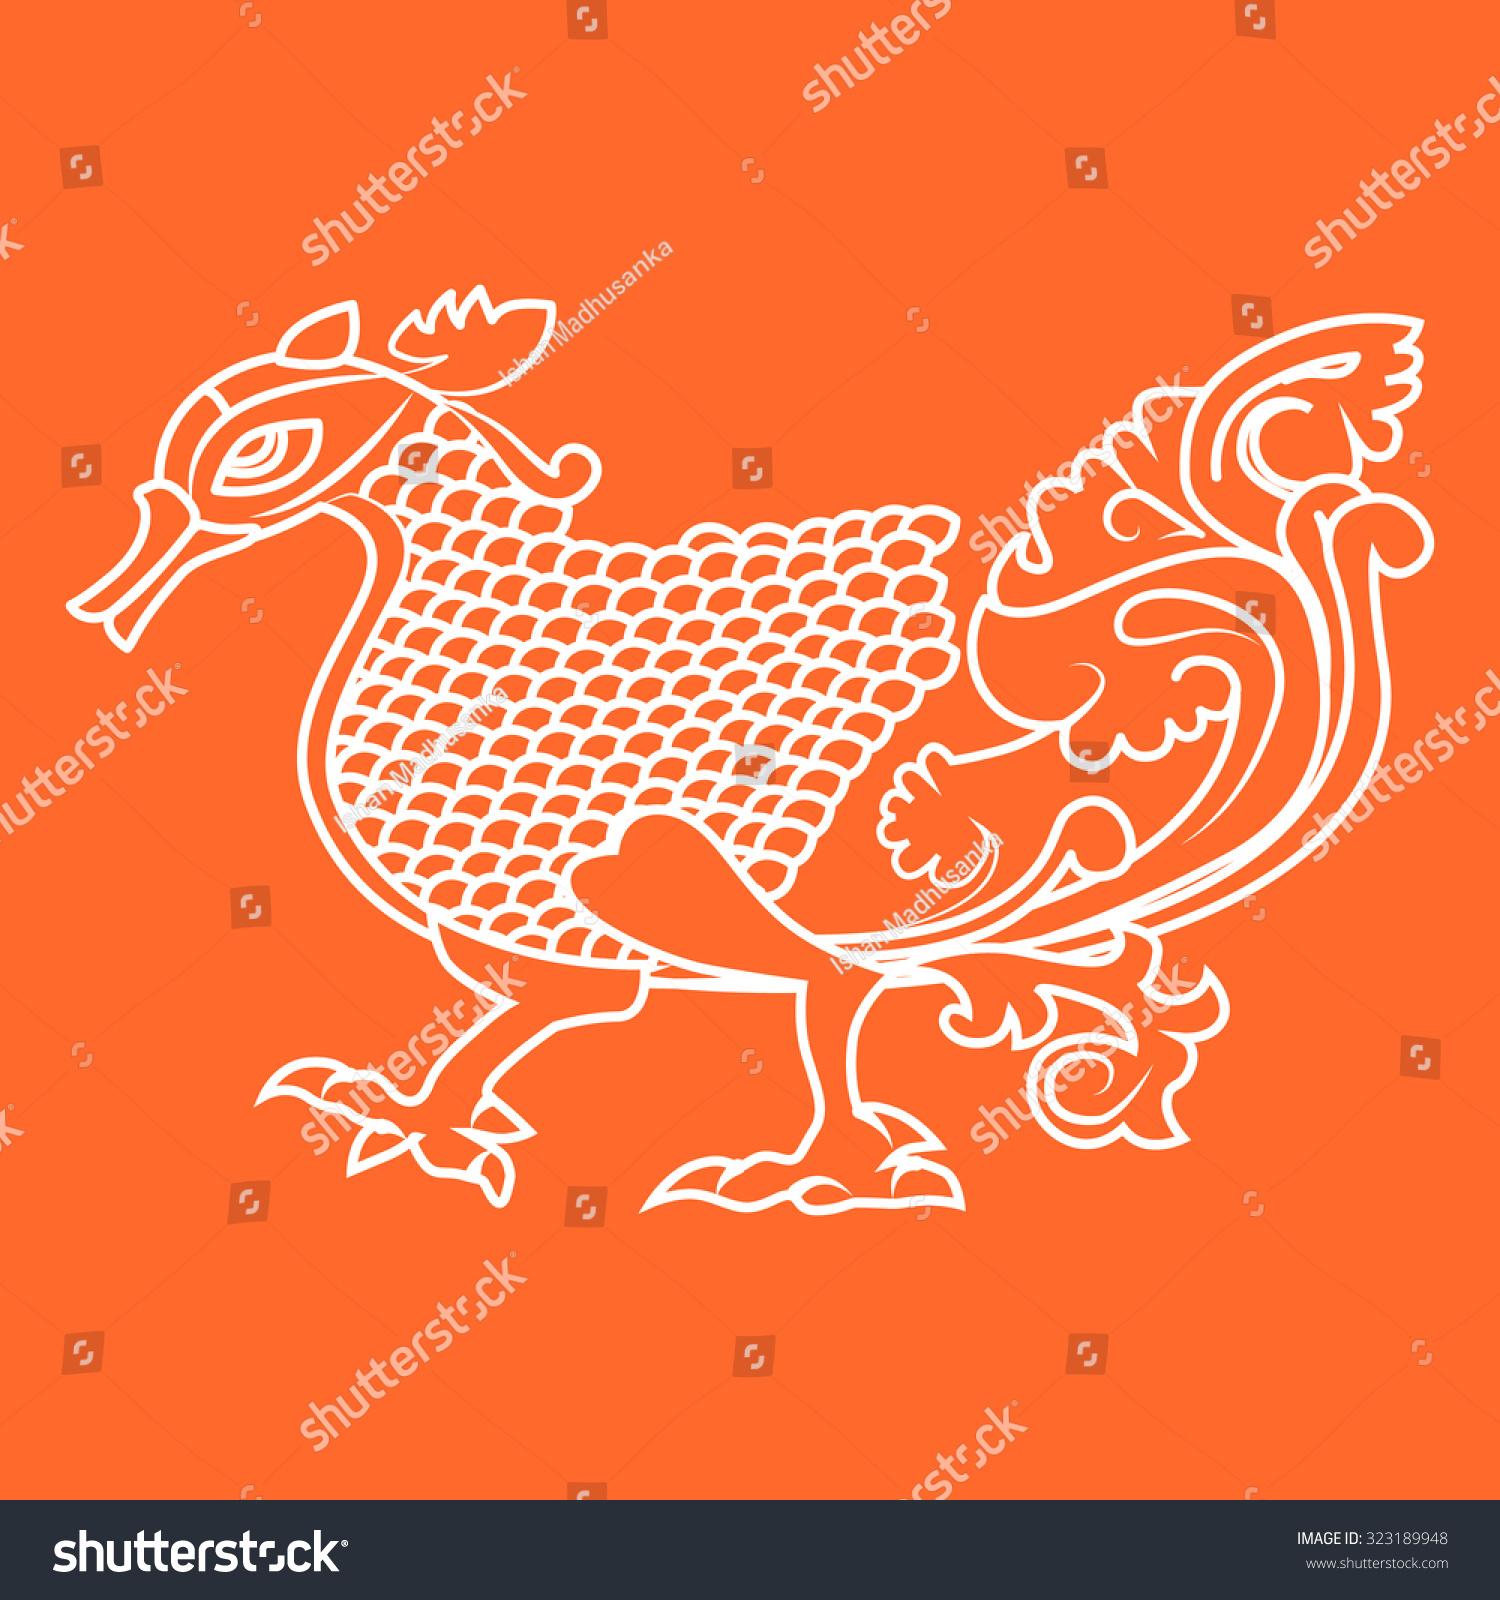 Minimal vector illustration vintage dragon sri stock for Minimal art vector